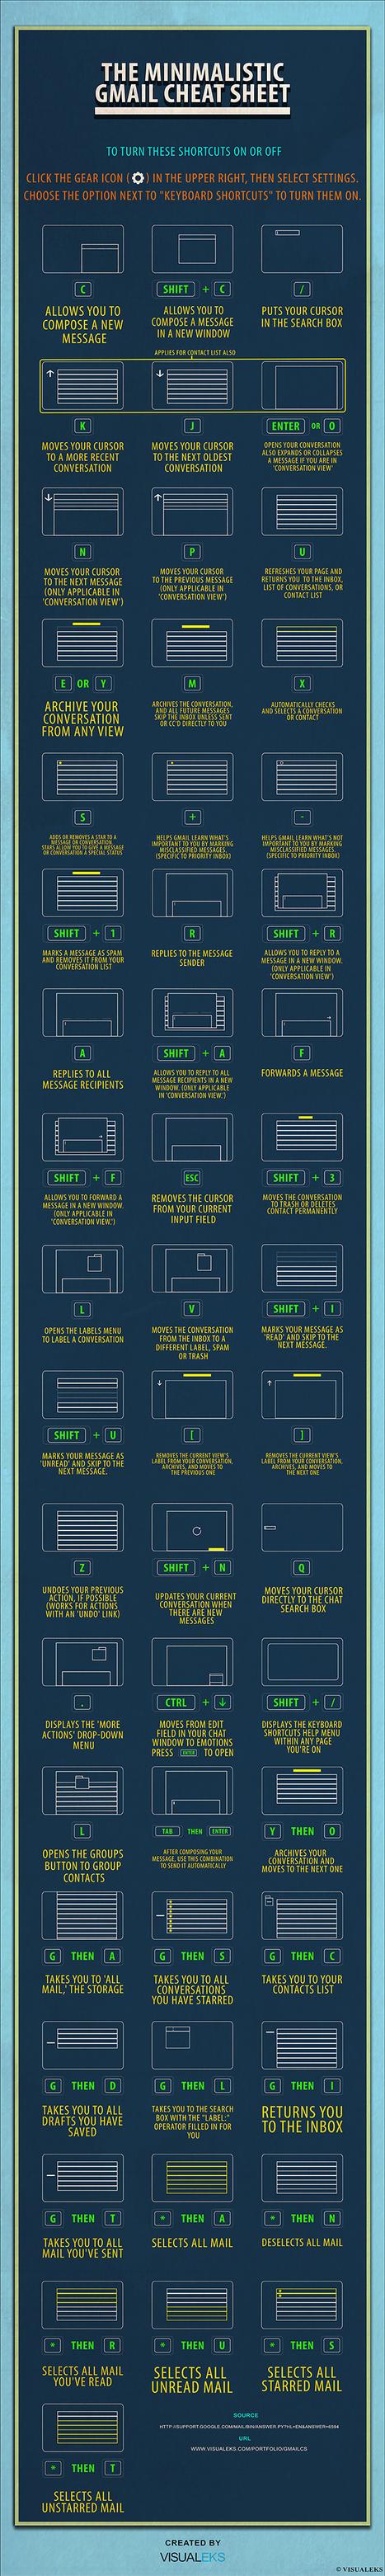 The Gmail Shortcut Cheat Sheet - Lifehack | Simply Social Media | Scoop.it